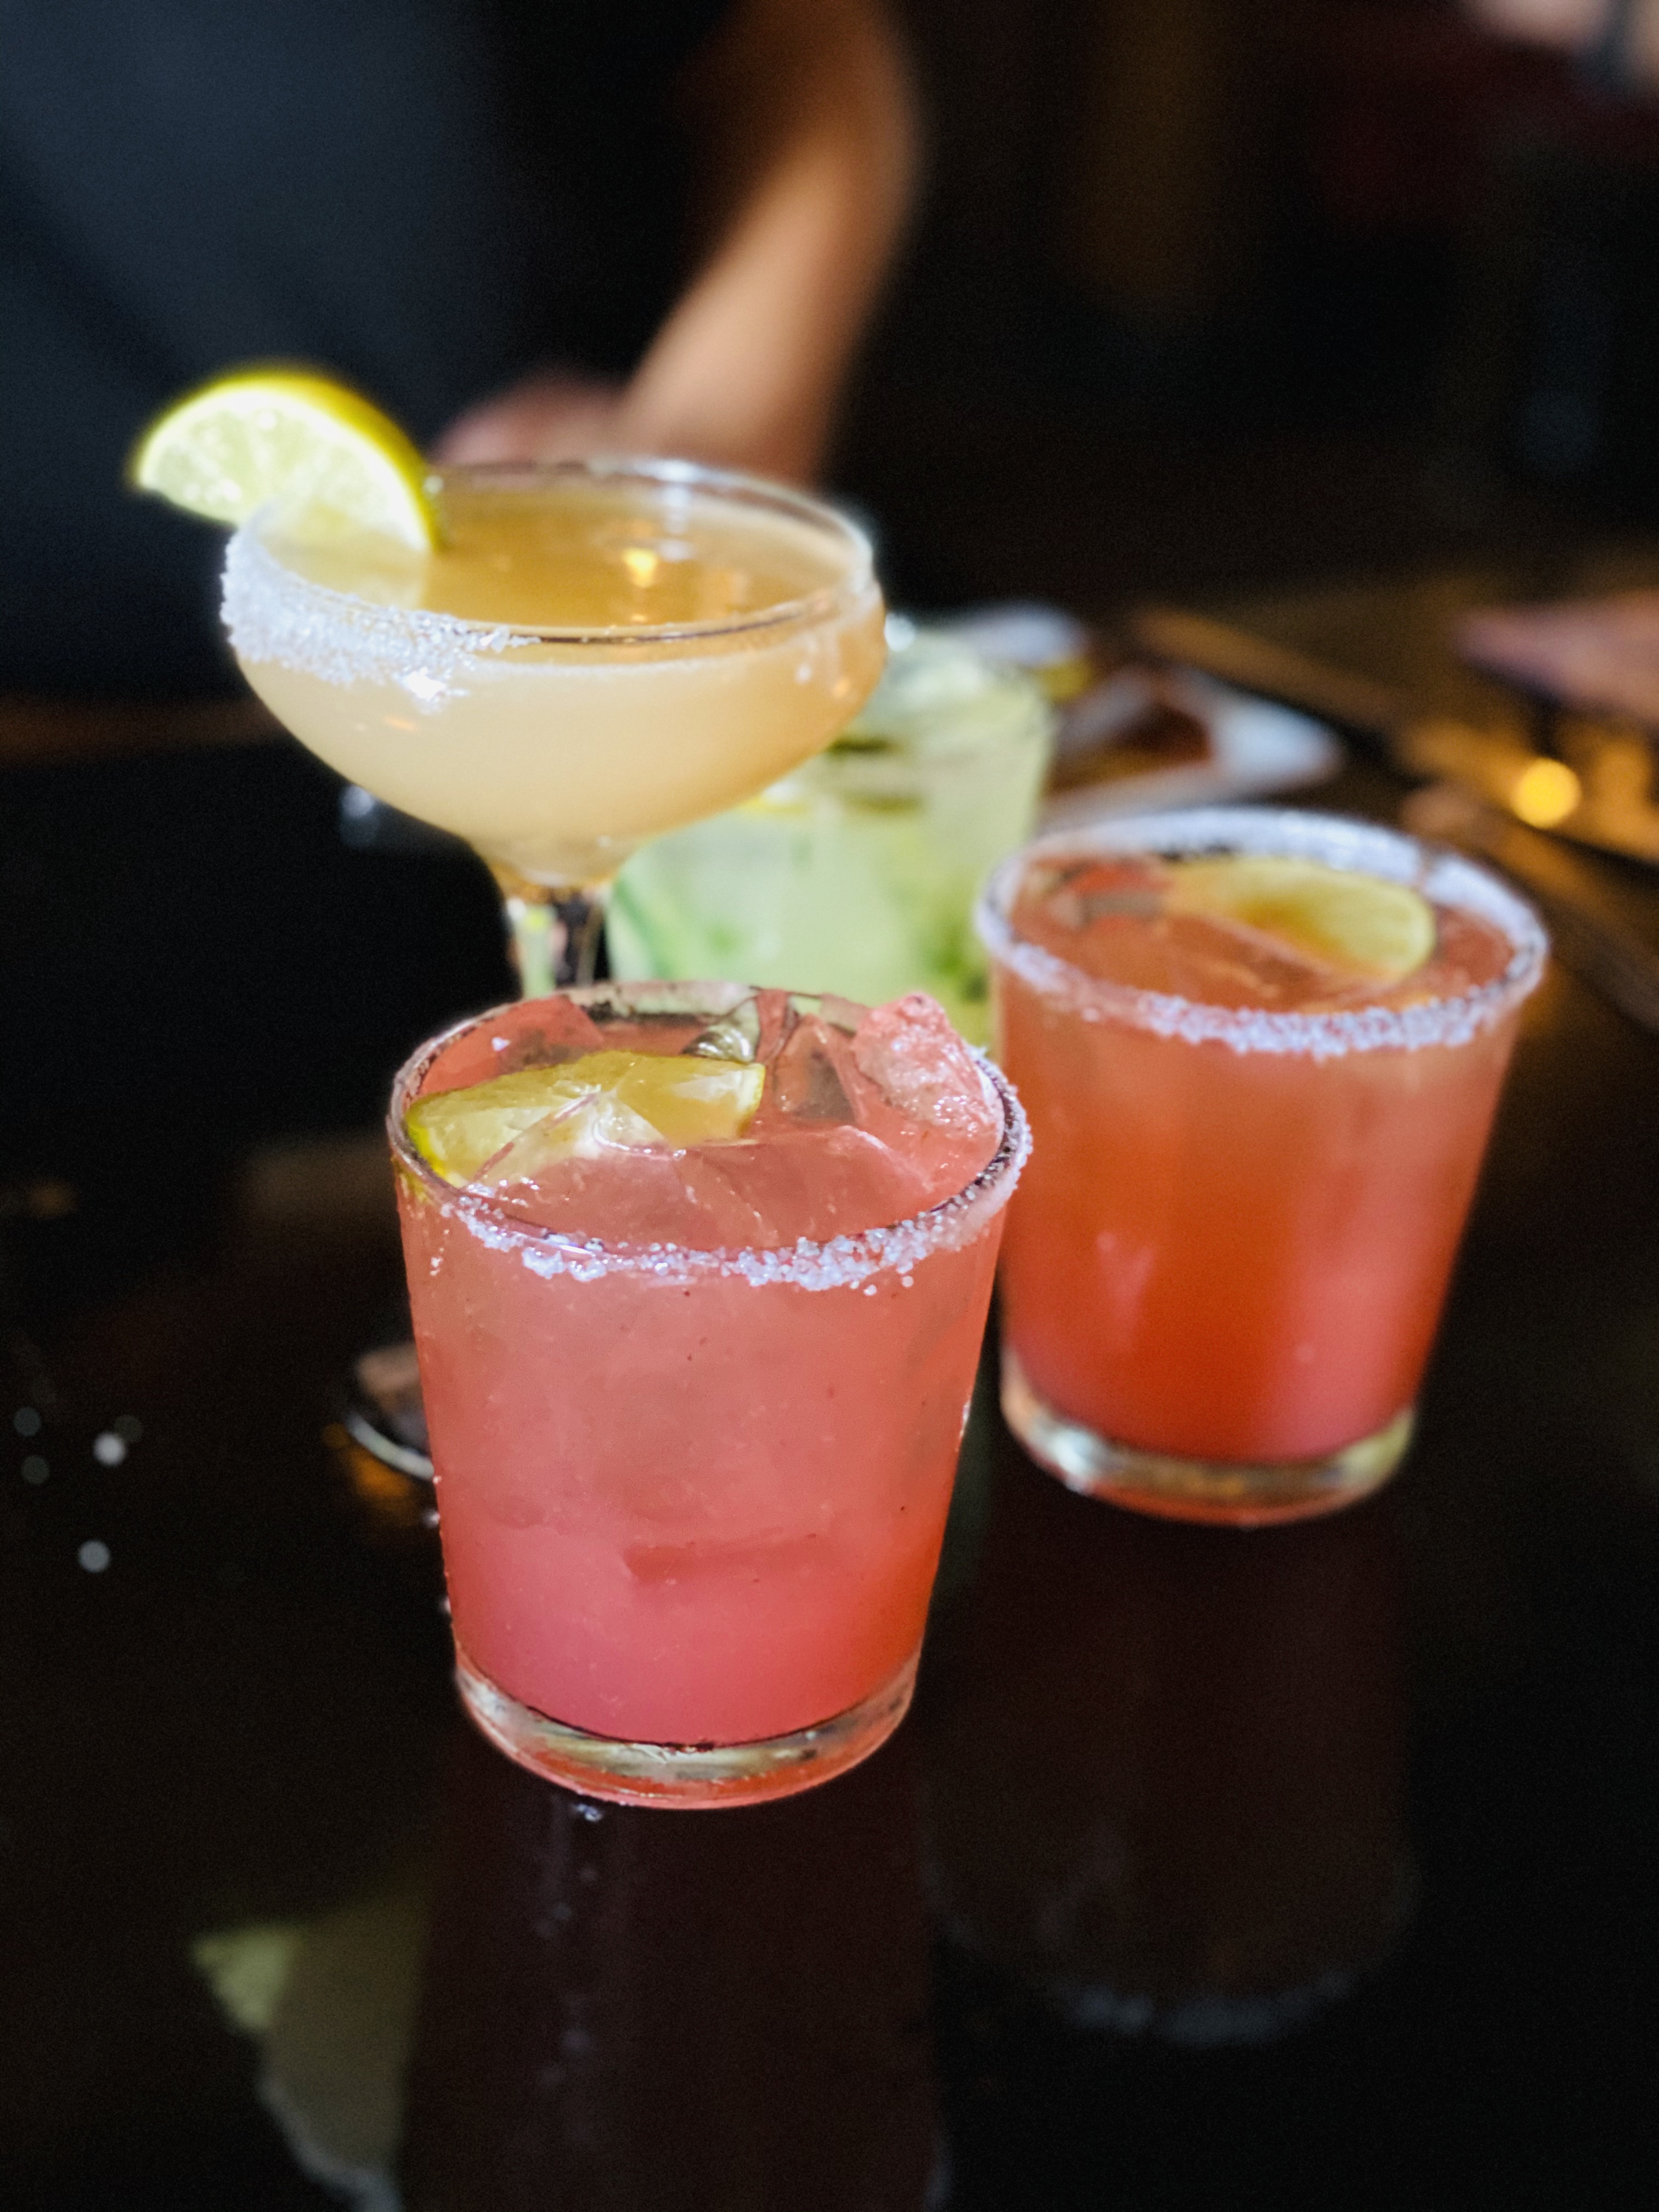 Photos of Margaritas in Scottsdale.